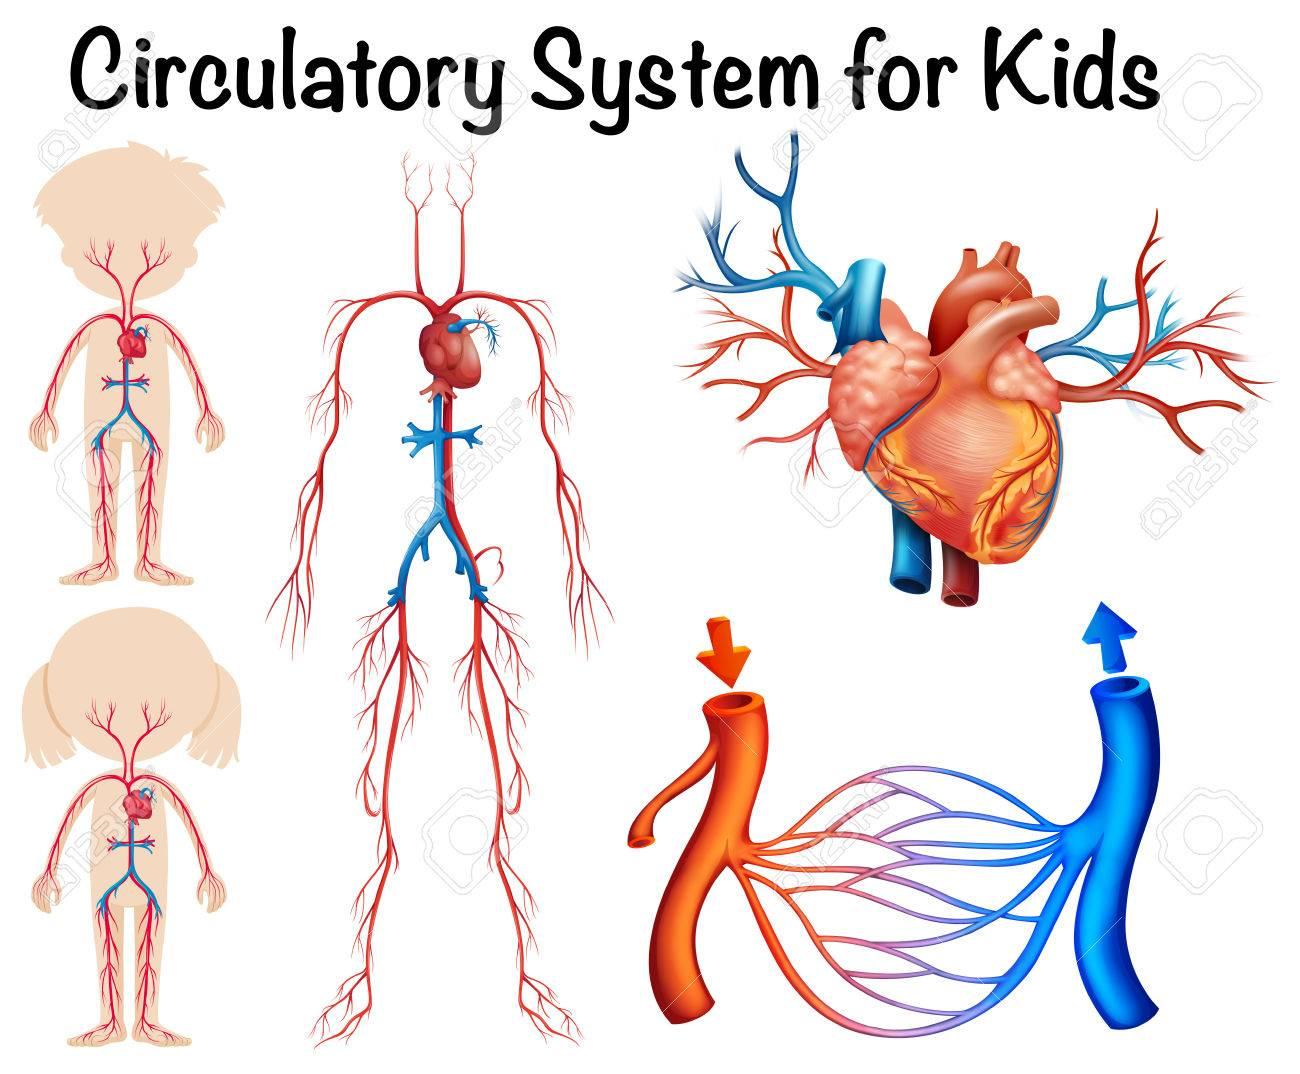 Circulatory system for kids illustration.